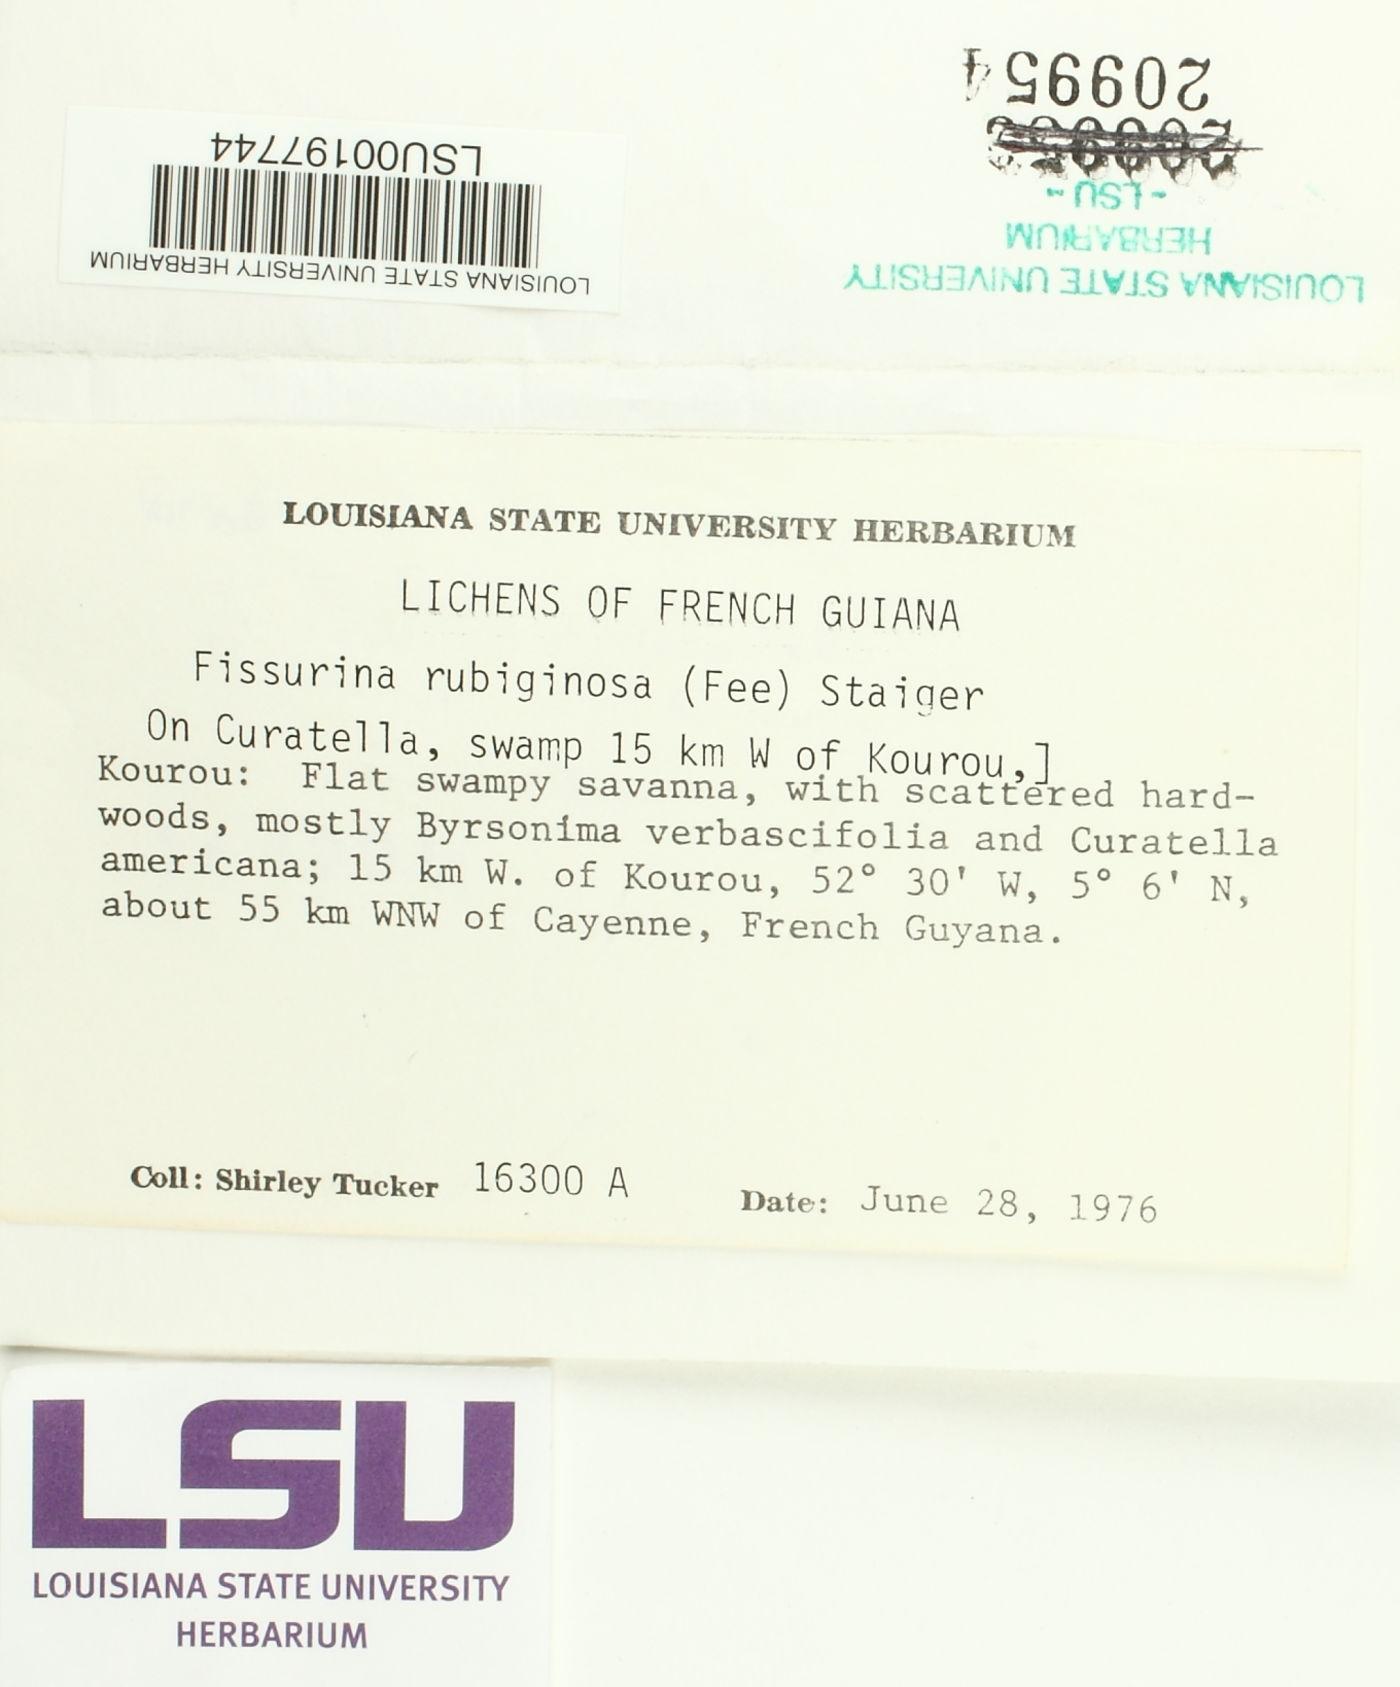 Fissurina rubiginosa image